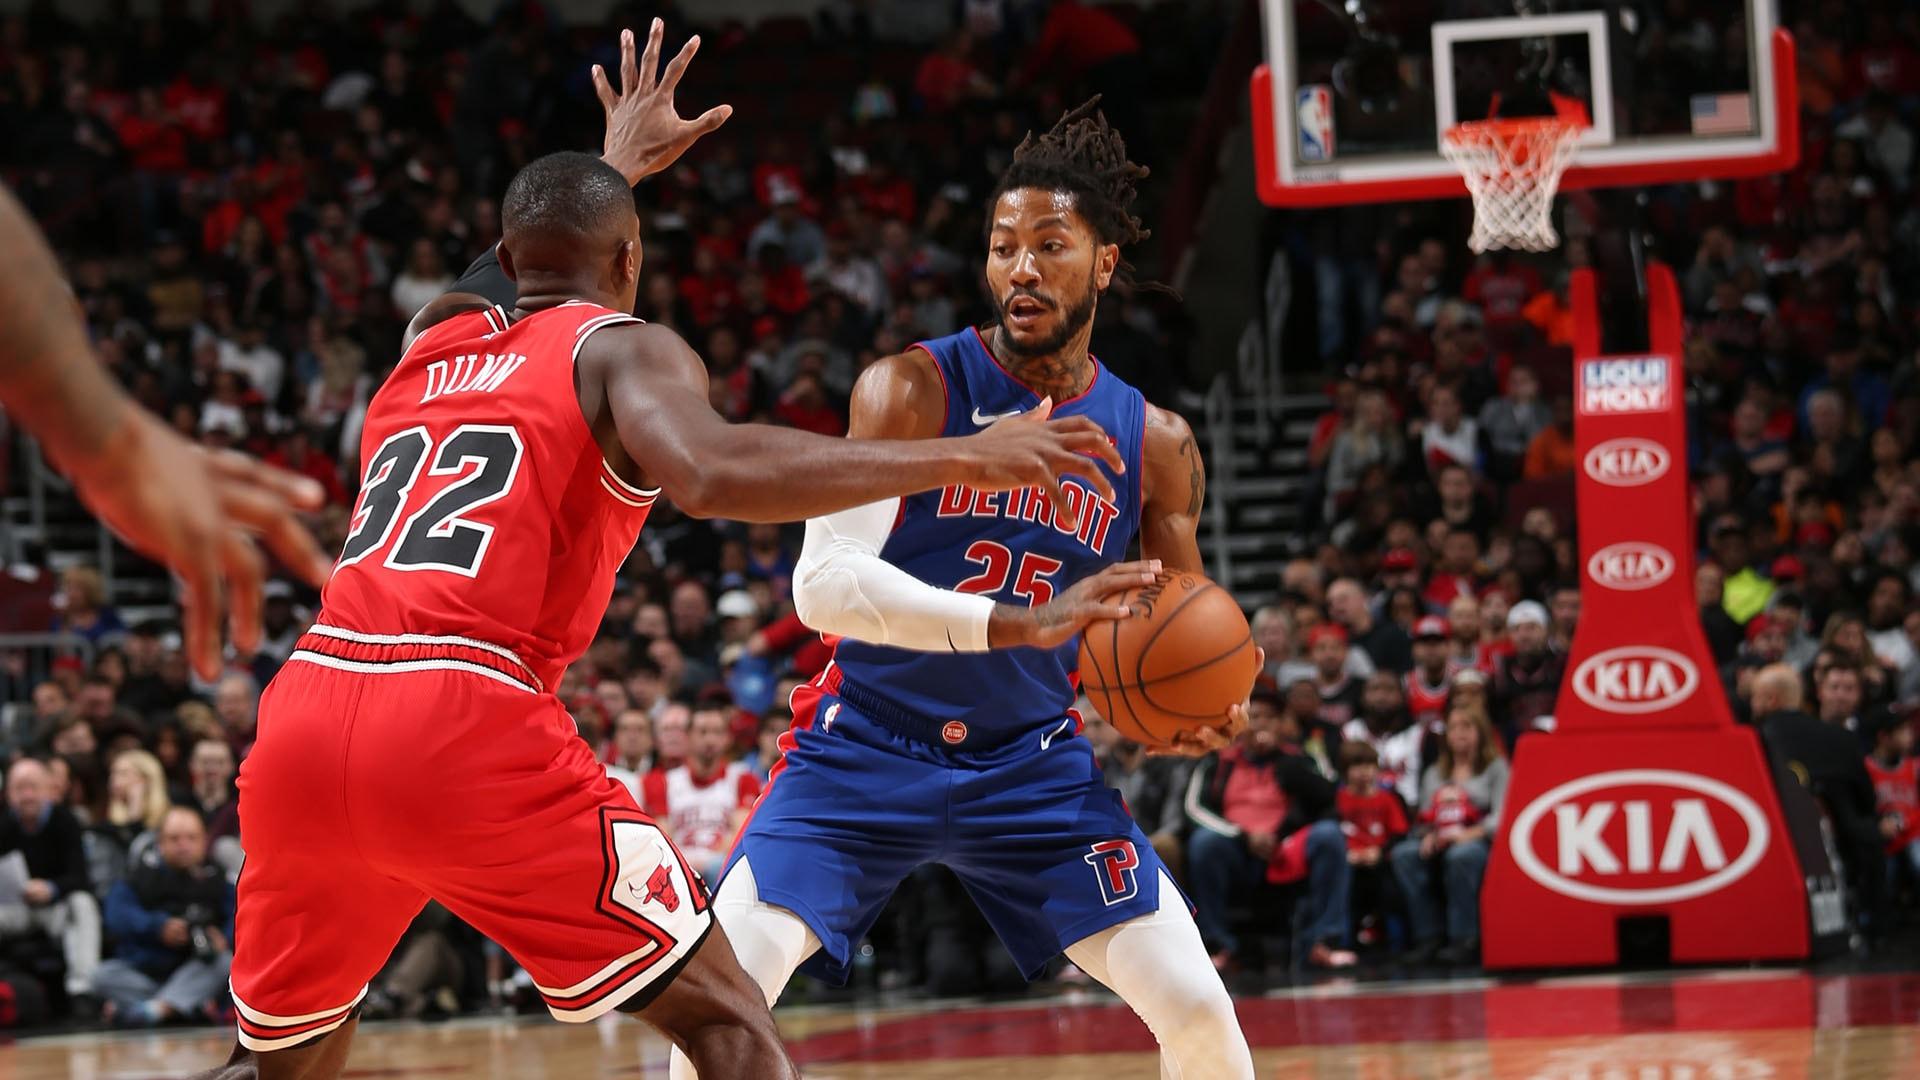 Pistons @ Bulls